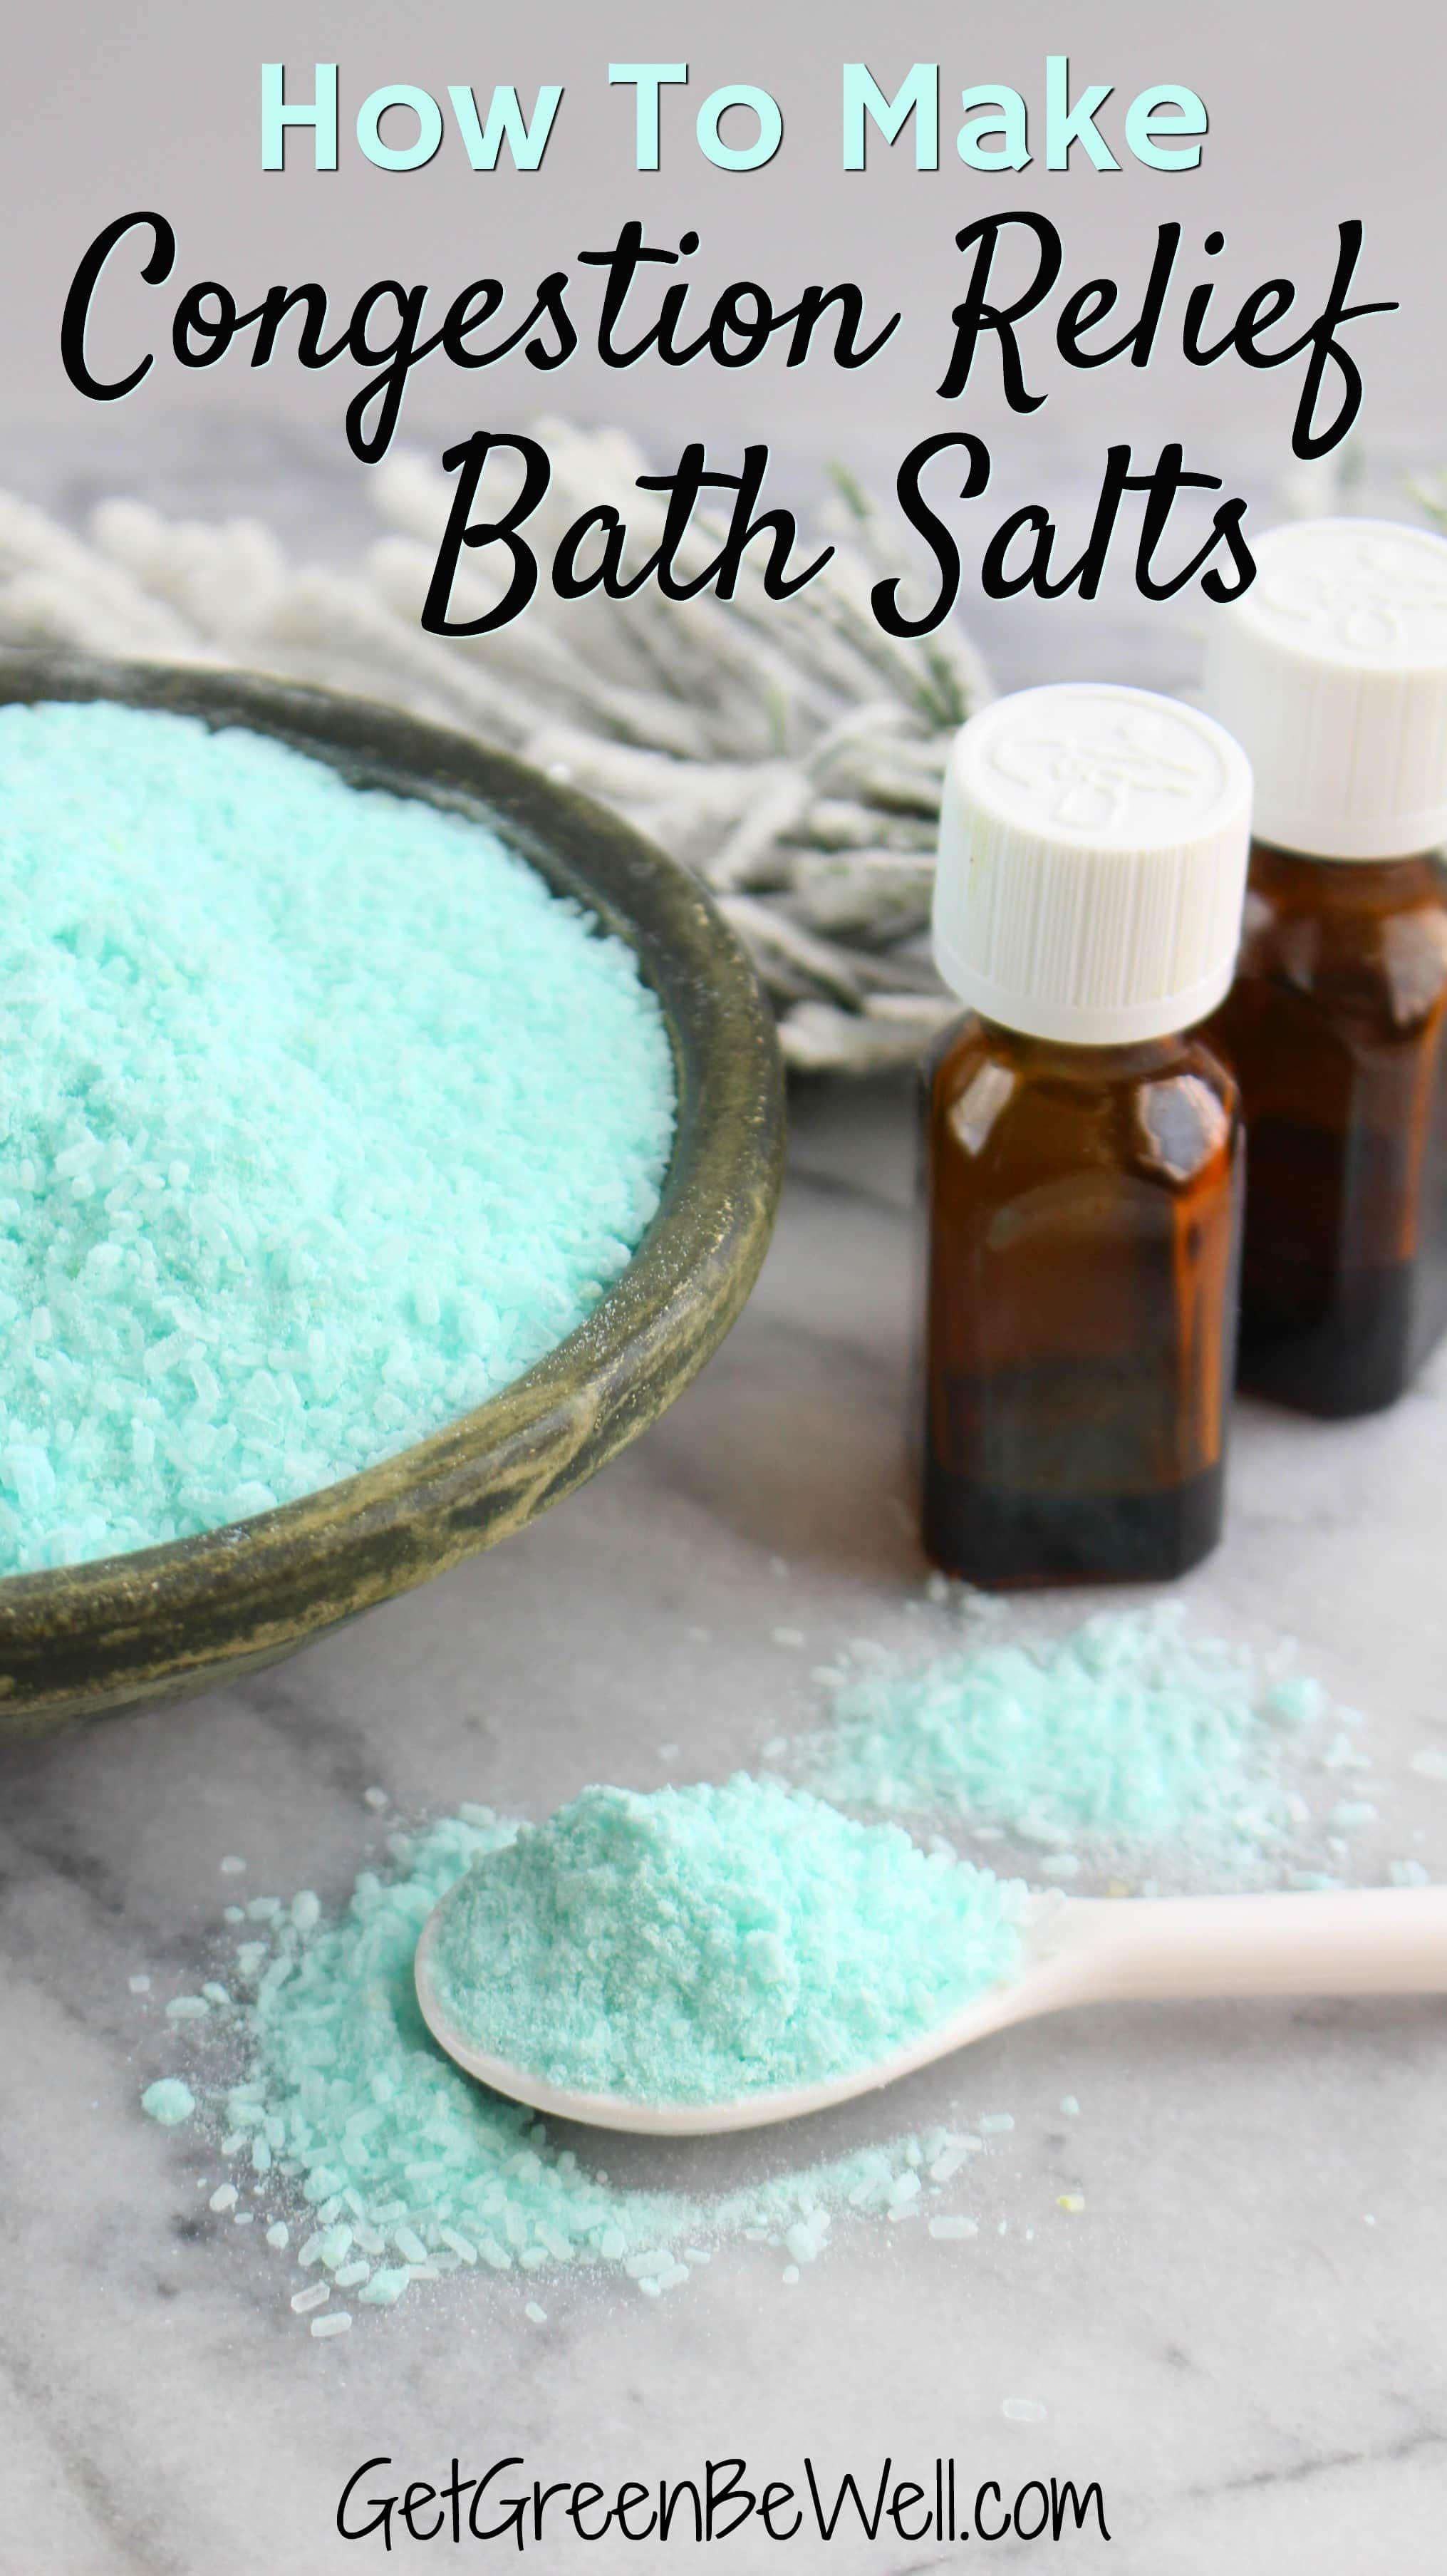 Diy sinus congestion relief bath salts recipe bath salts